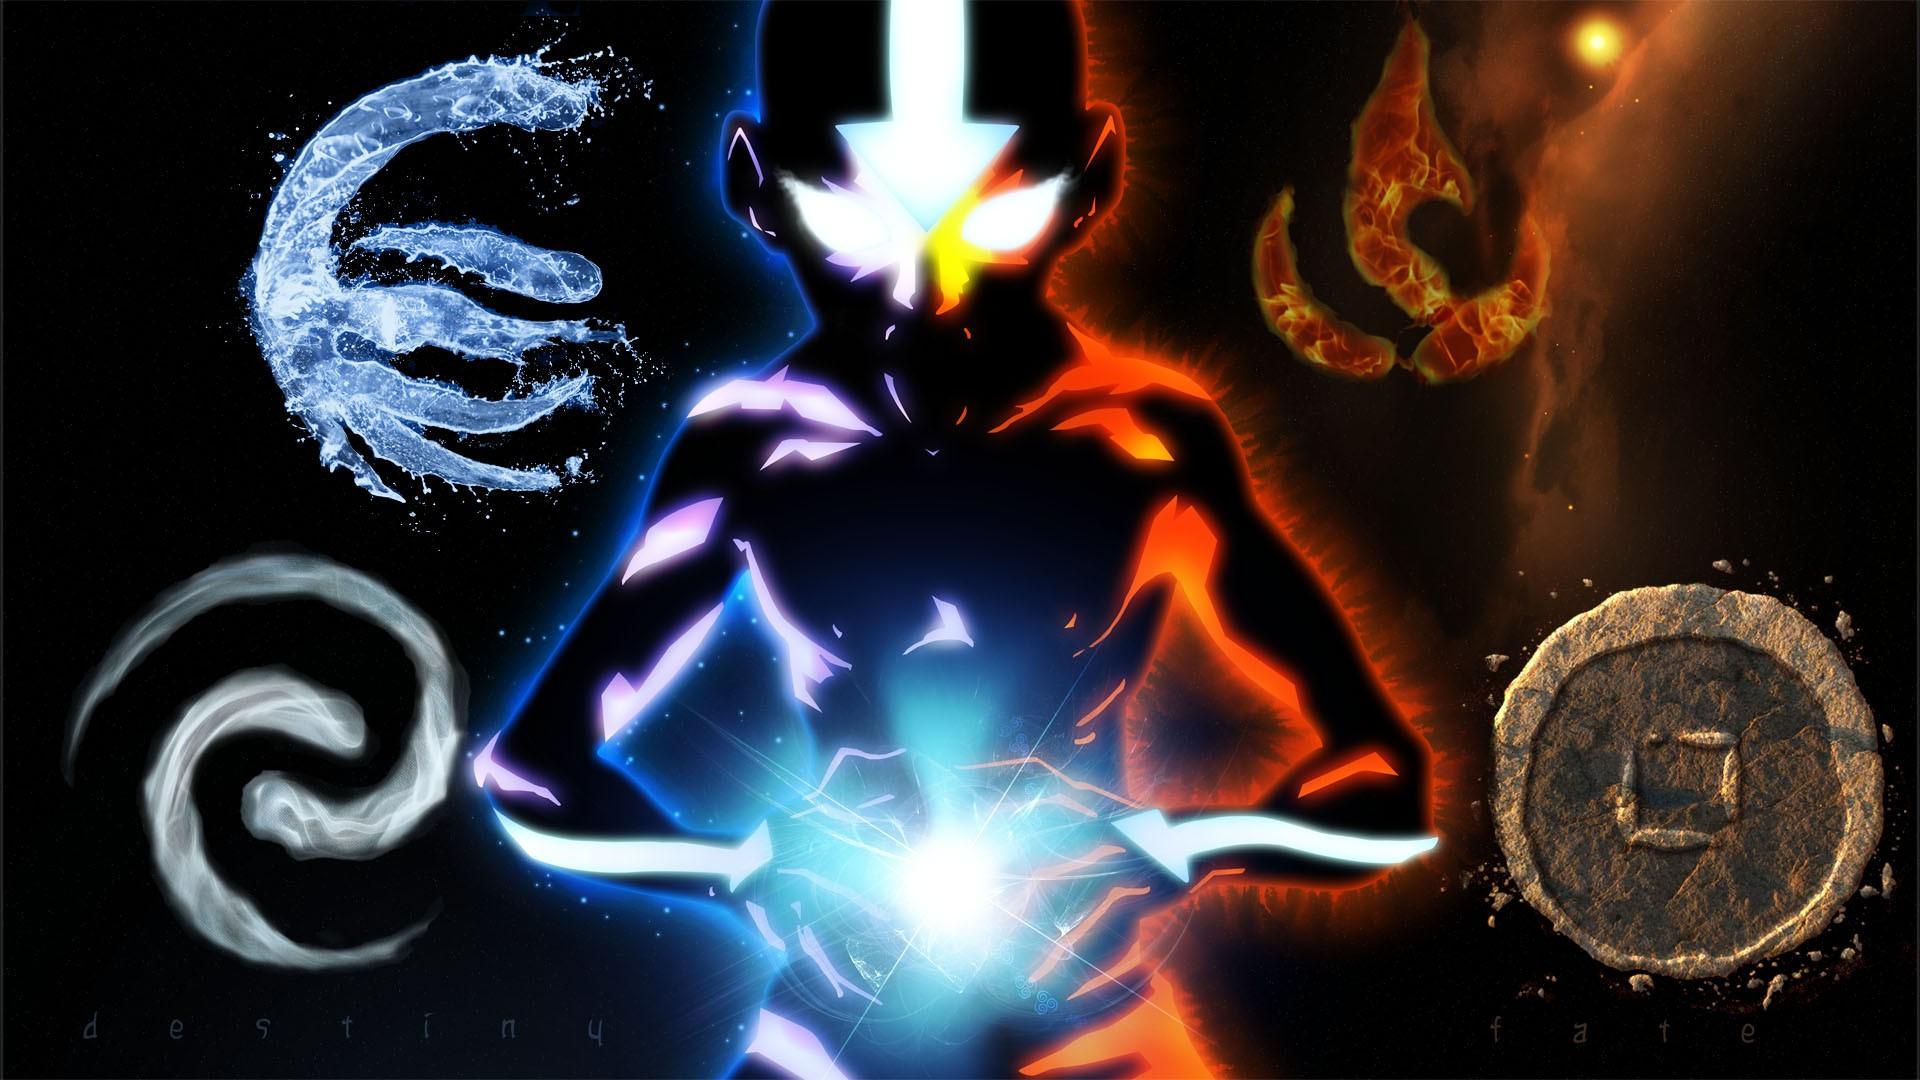 Wallpaper Avatar The Last Airbender Aang Darkness Screenshot